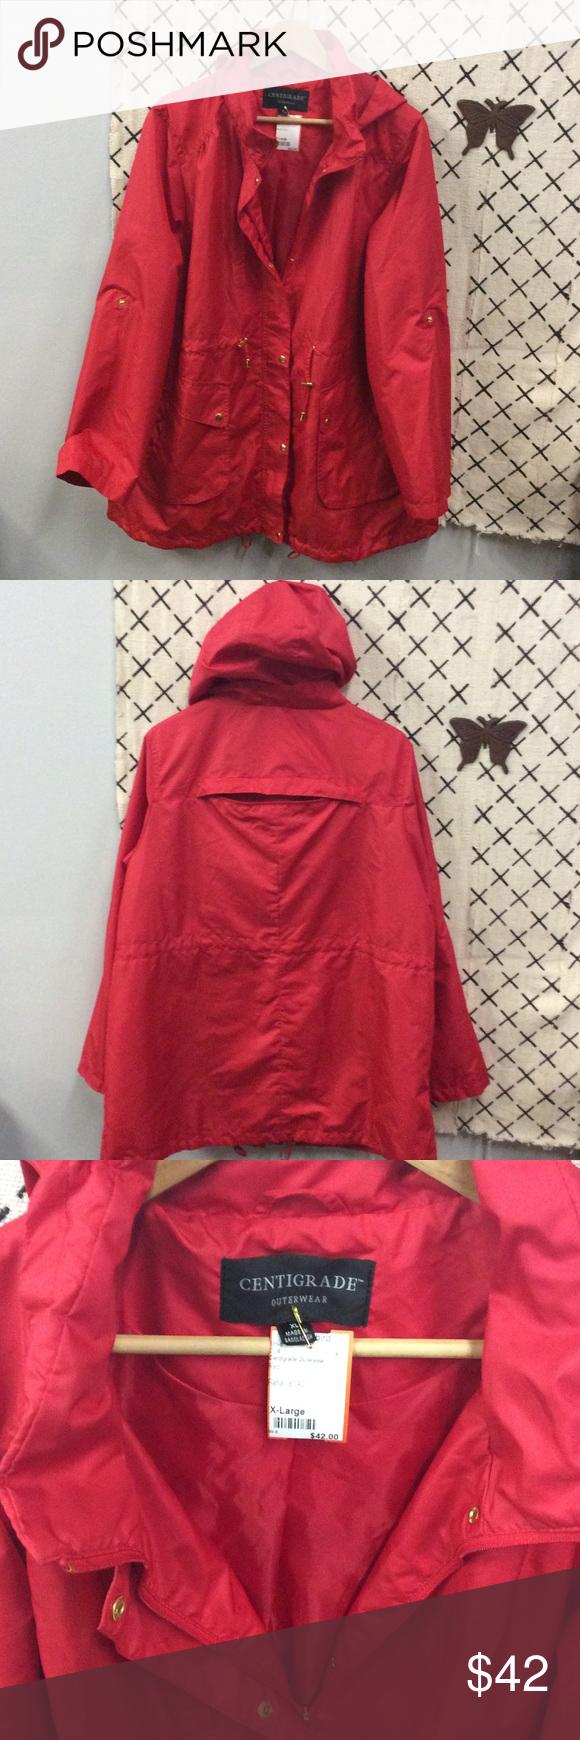 Centigrade Outerwear Rain Jacket Jackets Outerwear Jackets Rain Jacket [ 1740 x 580 Pixel ]